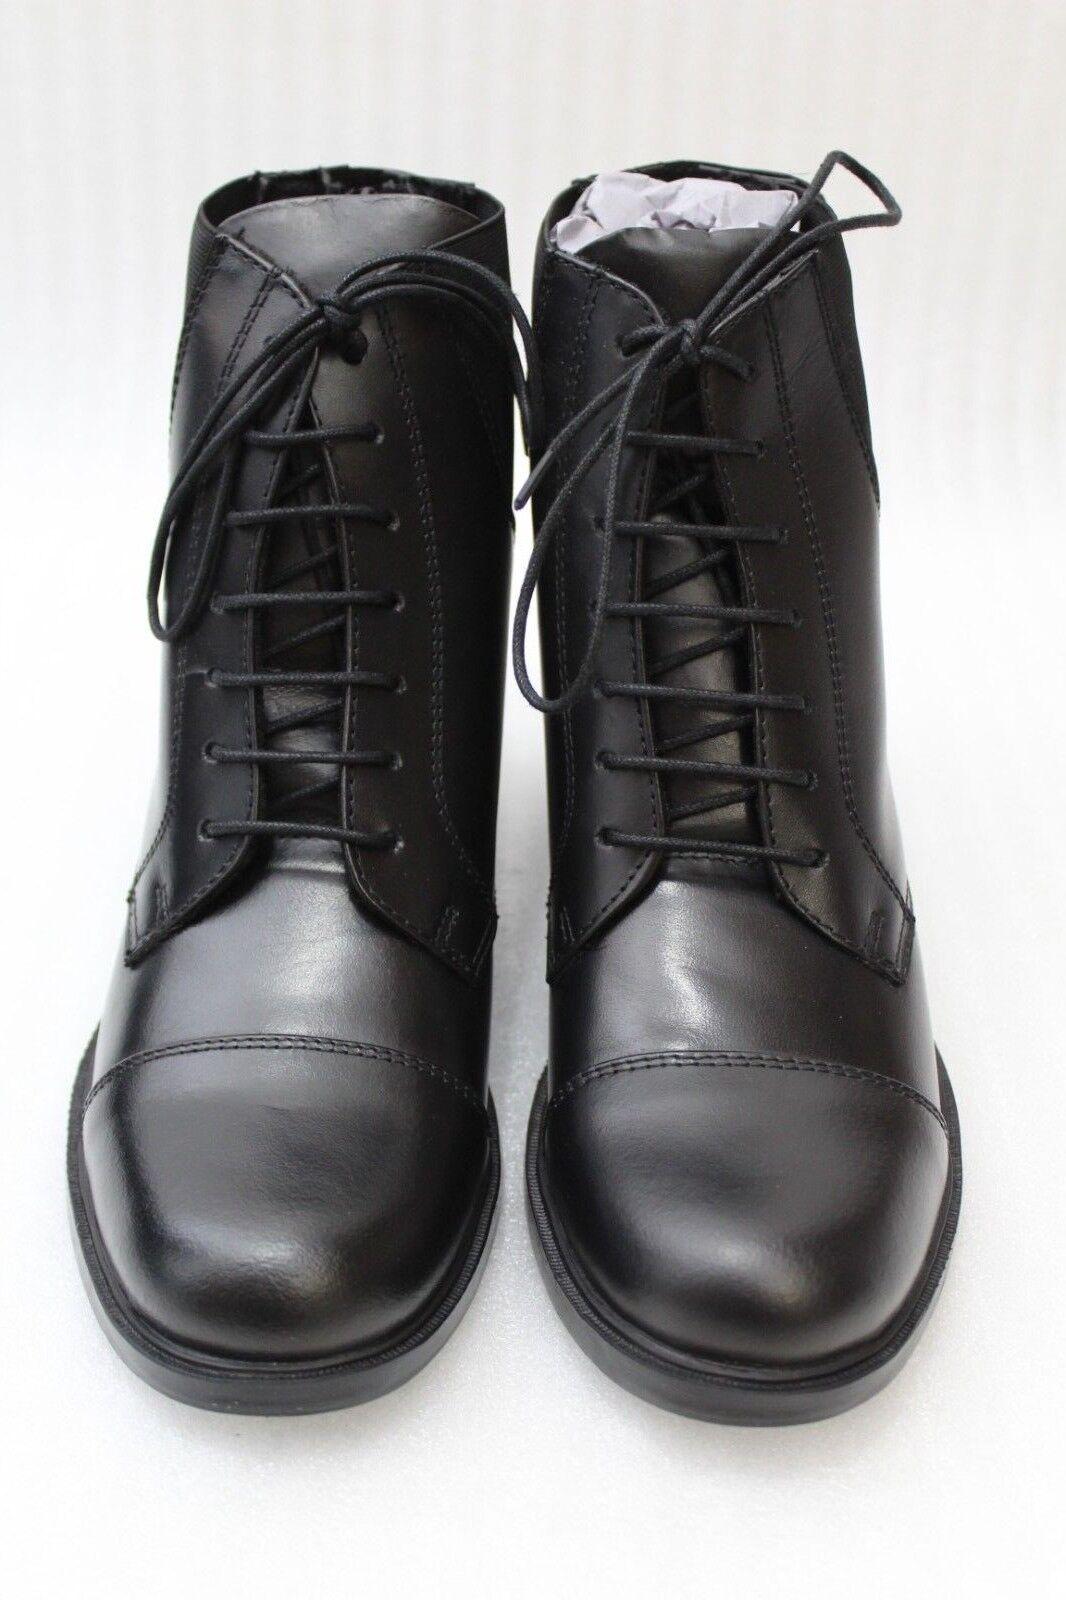 Brenton Deluxe Stable Reitstiefelette 545-BLK-38 Leder Größe 38 black NEU